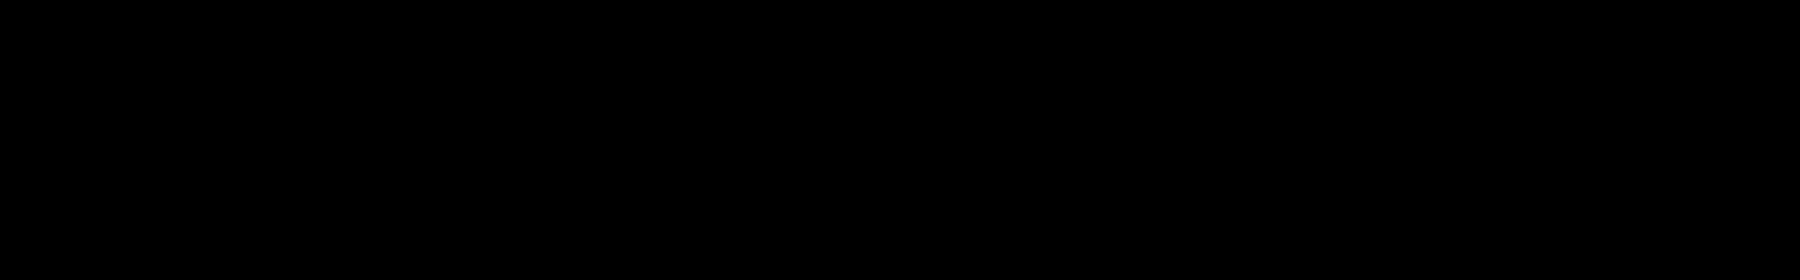 Kube Tech audio waveform